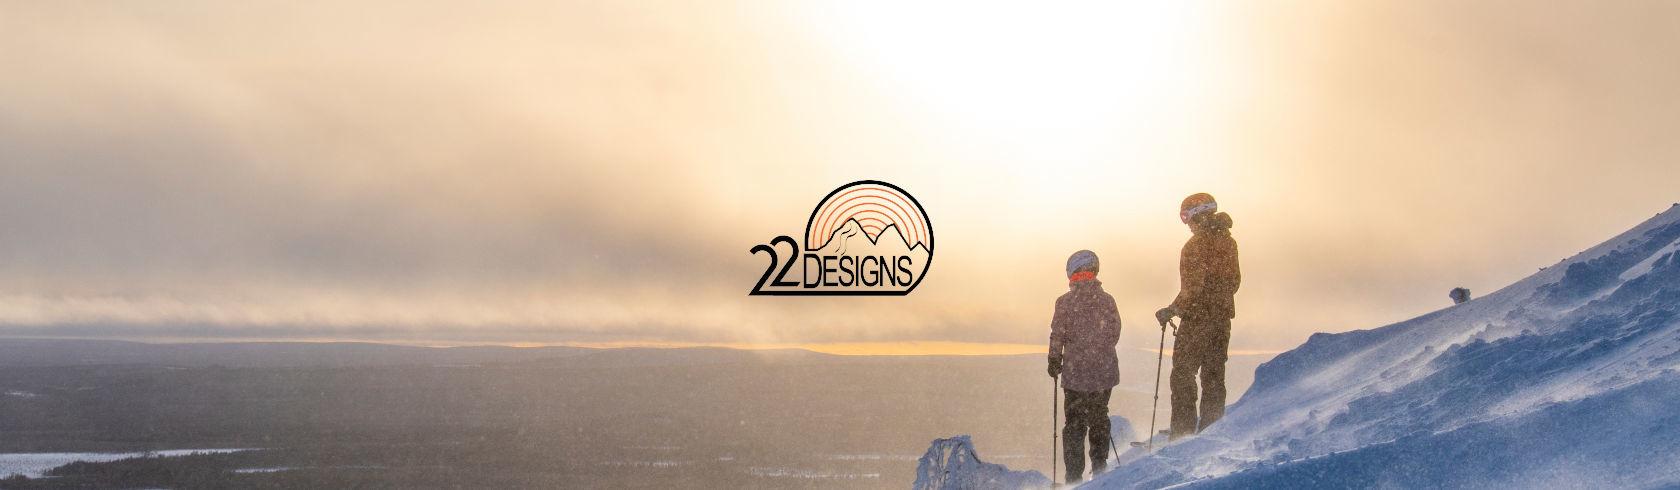 22 Designs brand logo